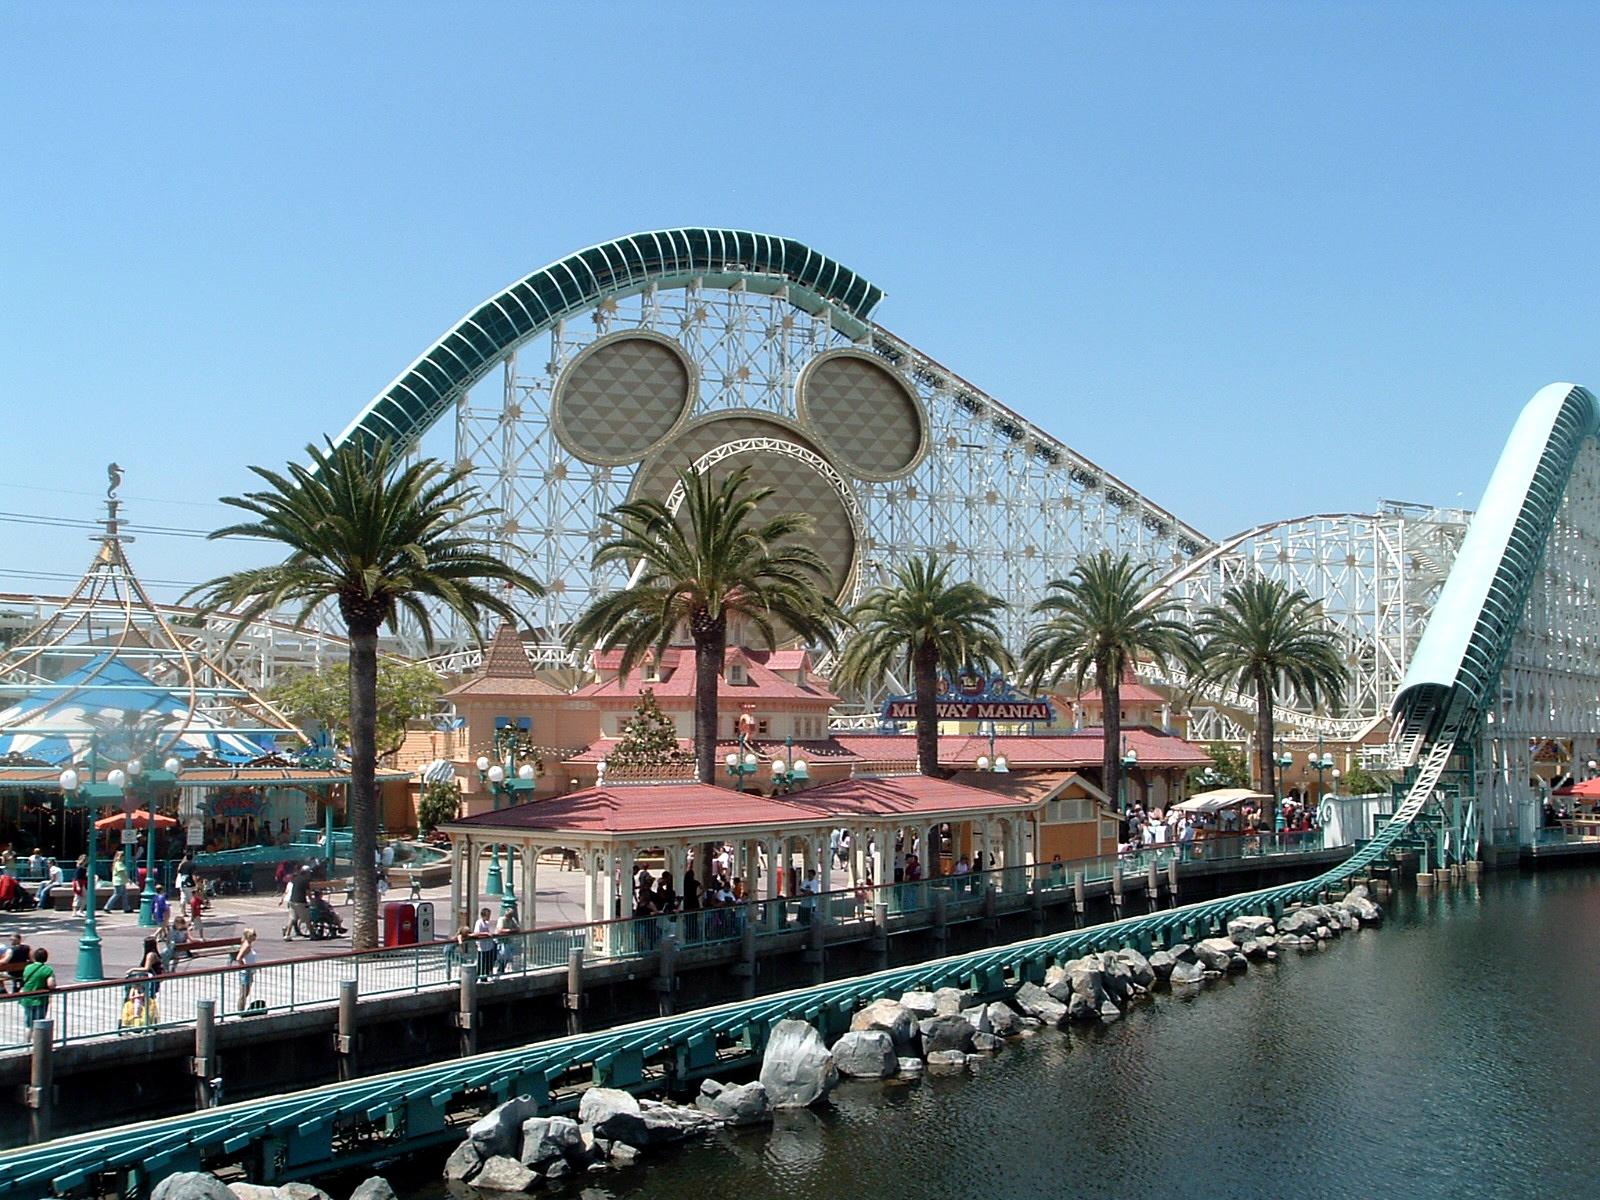 Riders get way more adventure as ride gets stuck in Disneyland